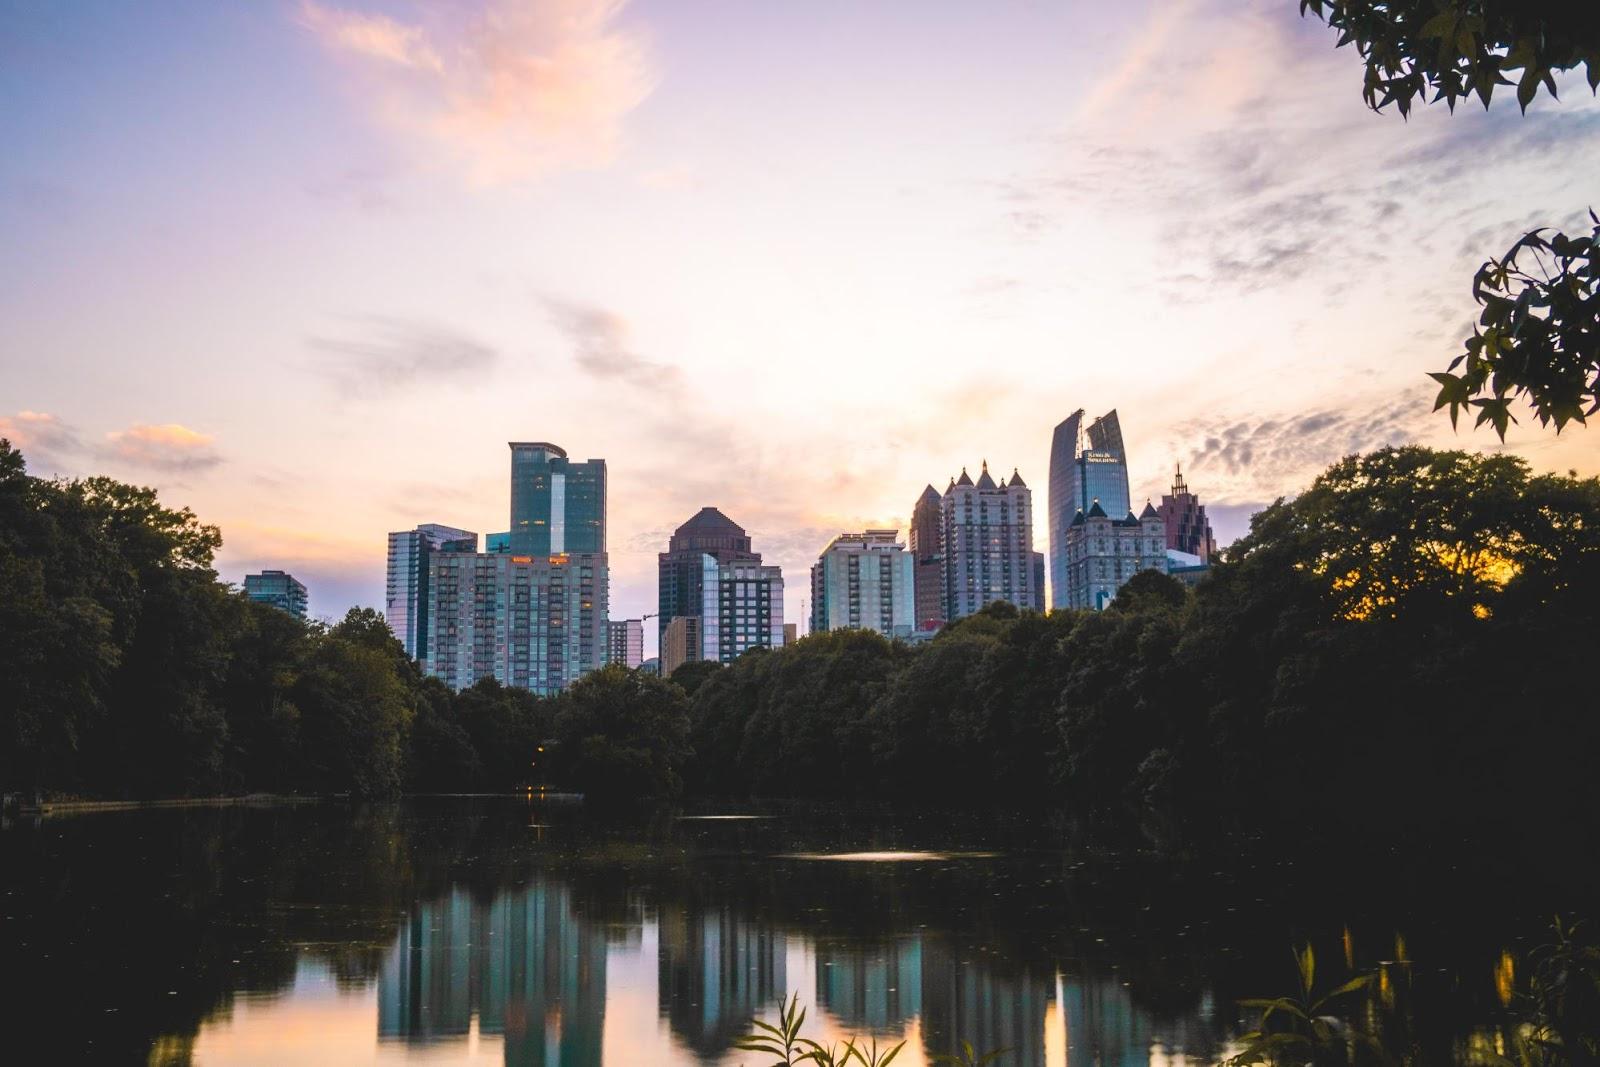 Skyline of Atlanta Georgia